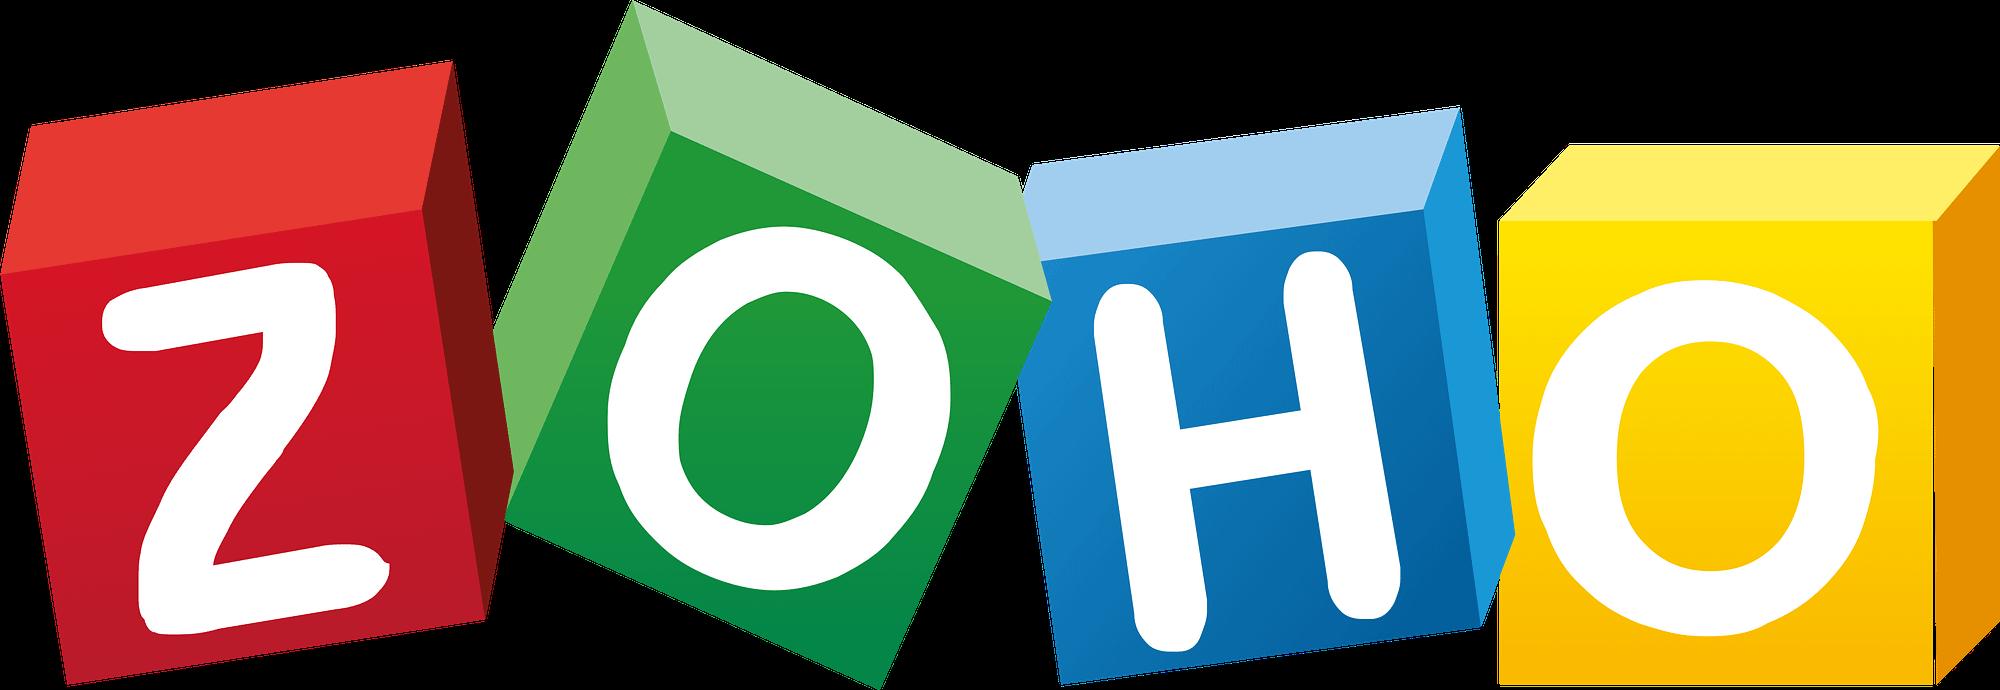 zoho-01